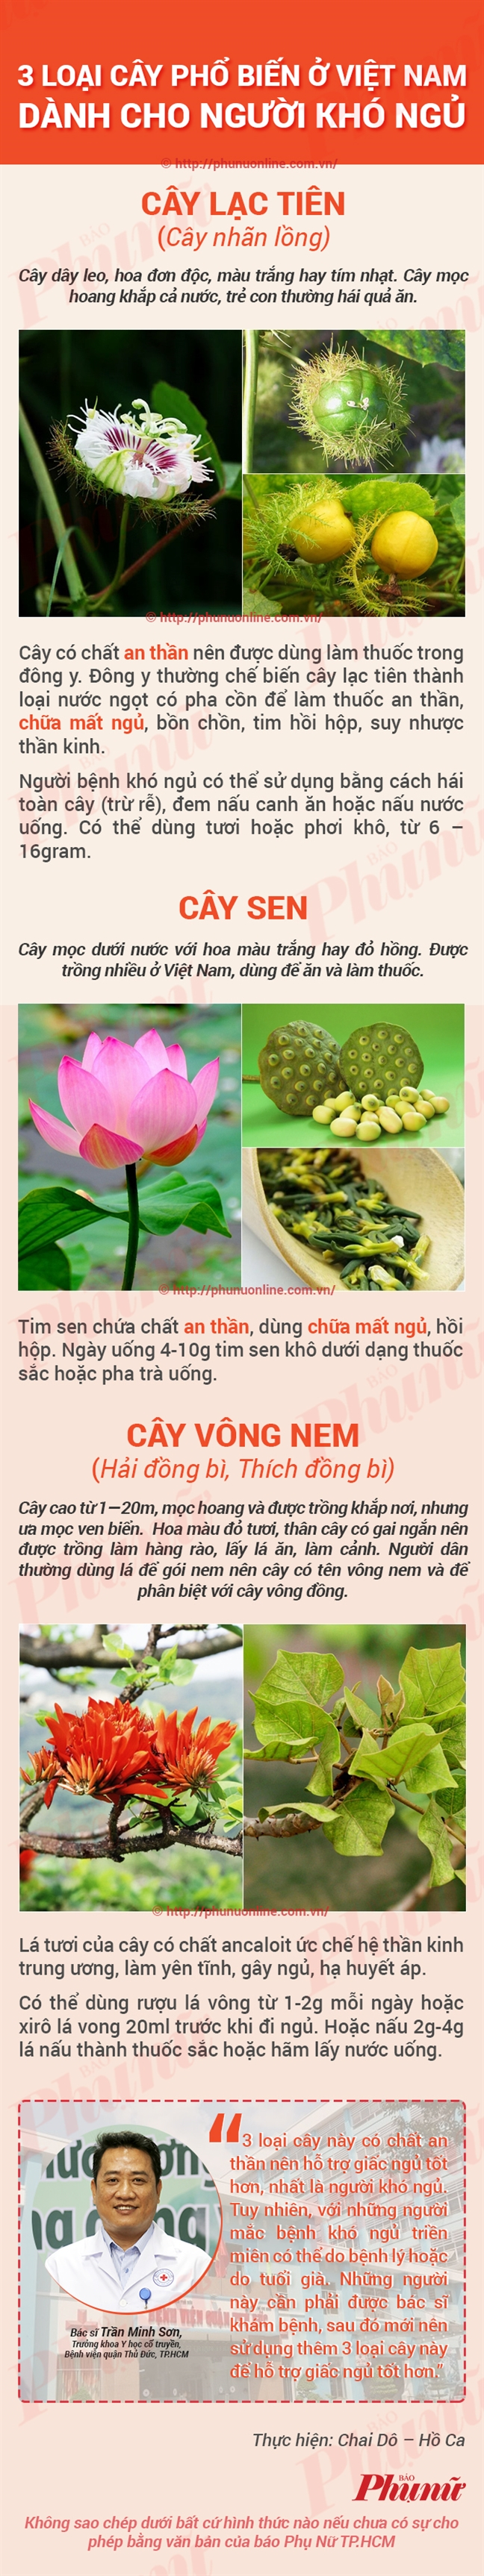 3 loai cay chua mat ngu rat de tim o Viet Nam